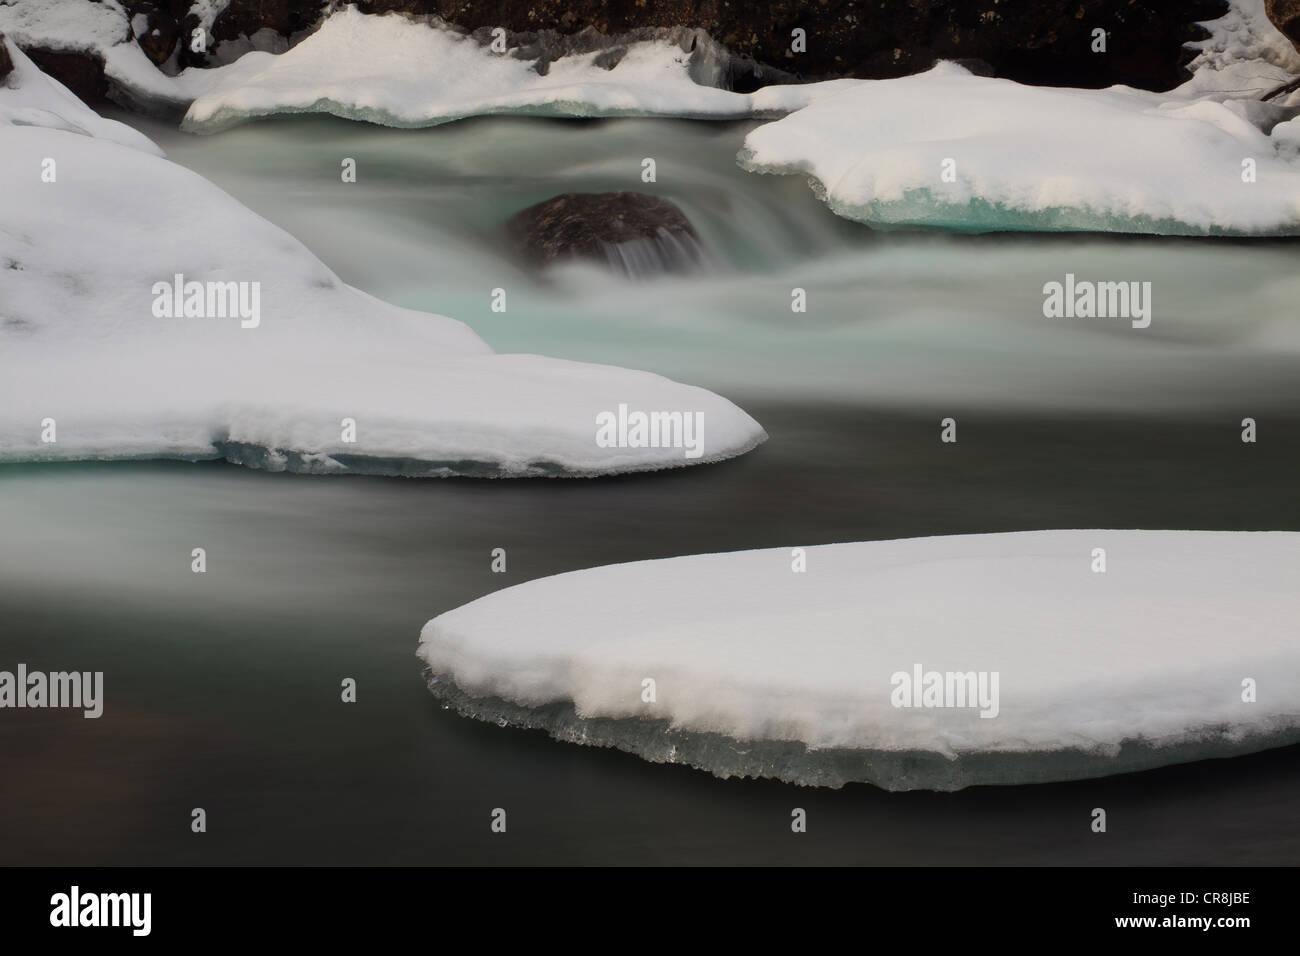 Neve e ghiaccio nel fiume Rauma, Romsdalen valley, Møre og Romsdal, Norvegia. Immagini Stock